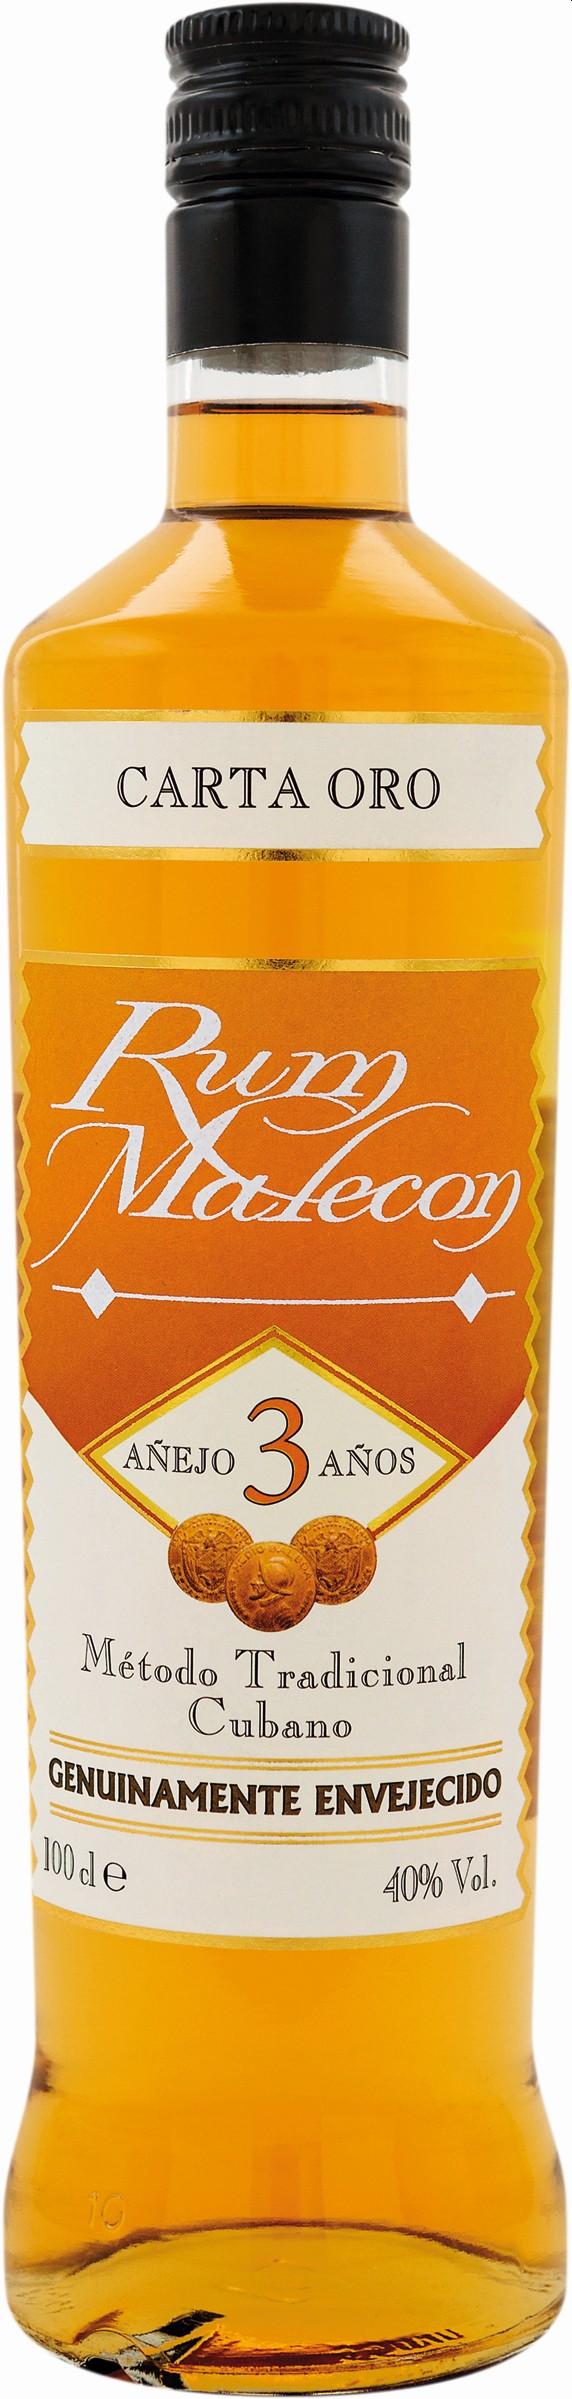 Malecon 3 Years Old Carta Oro